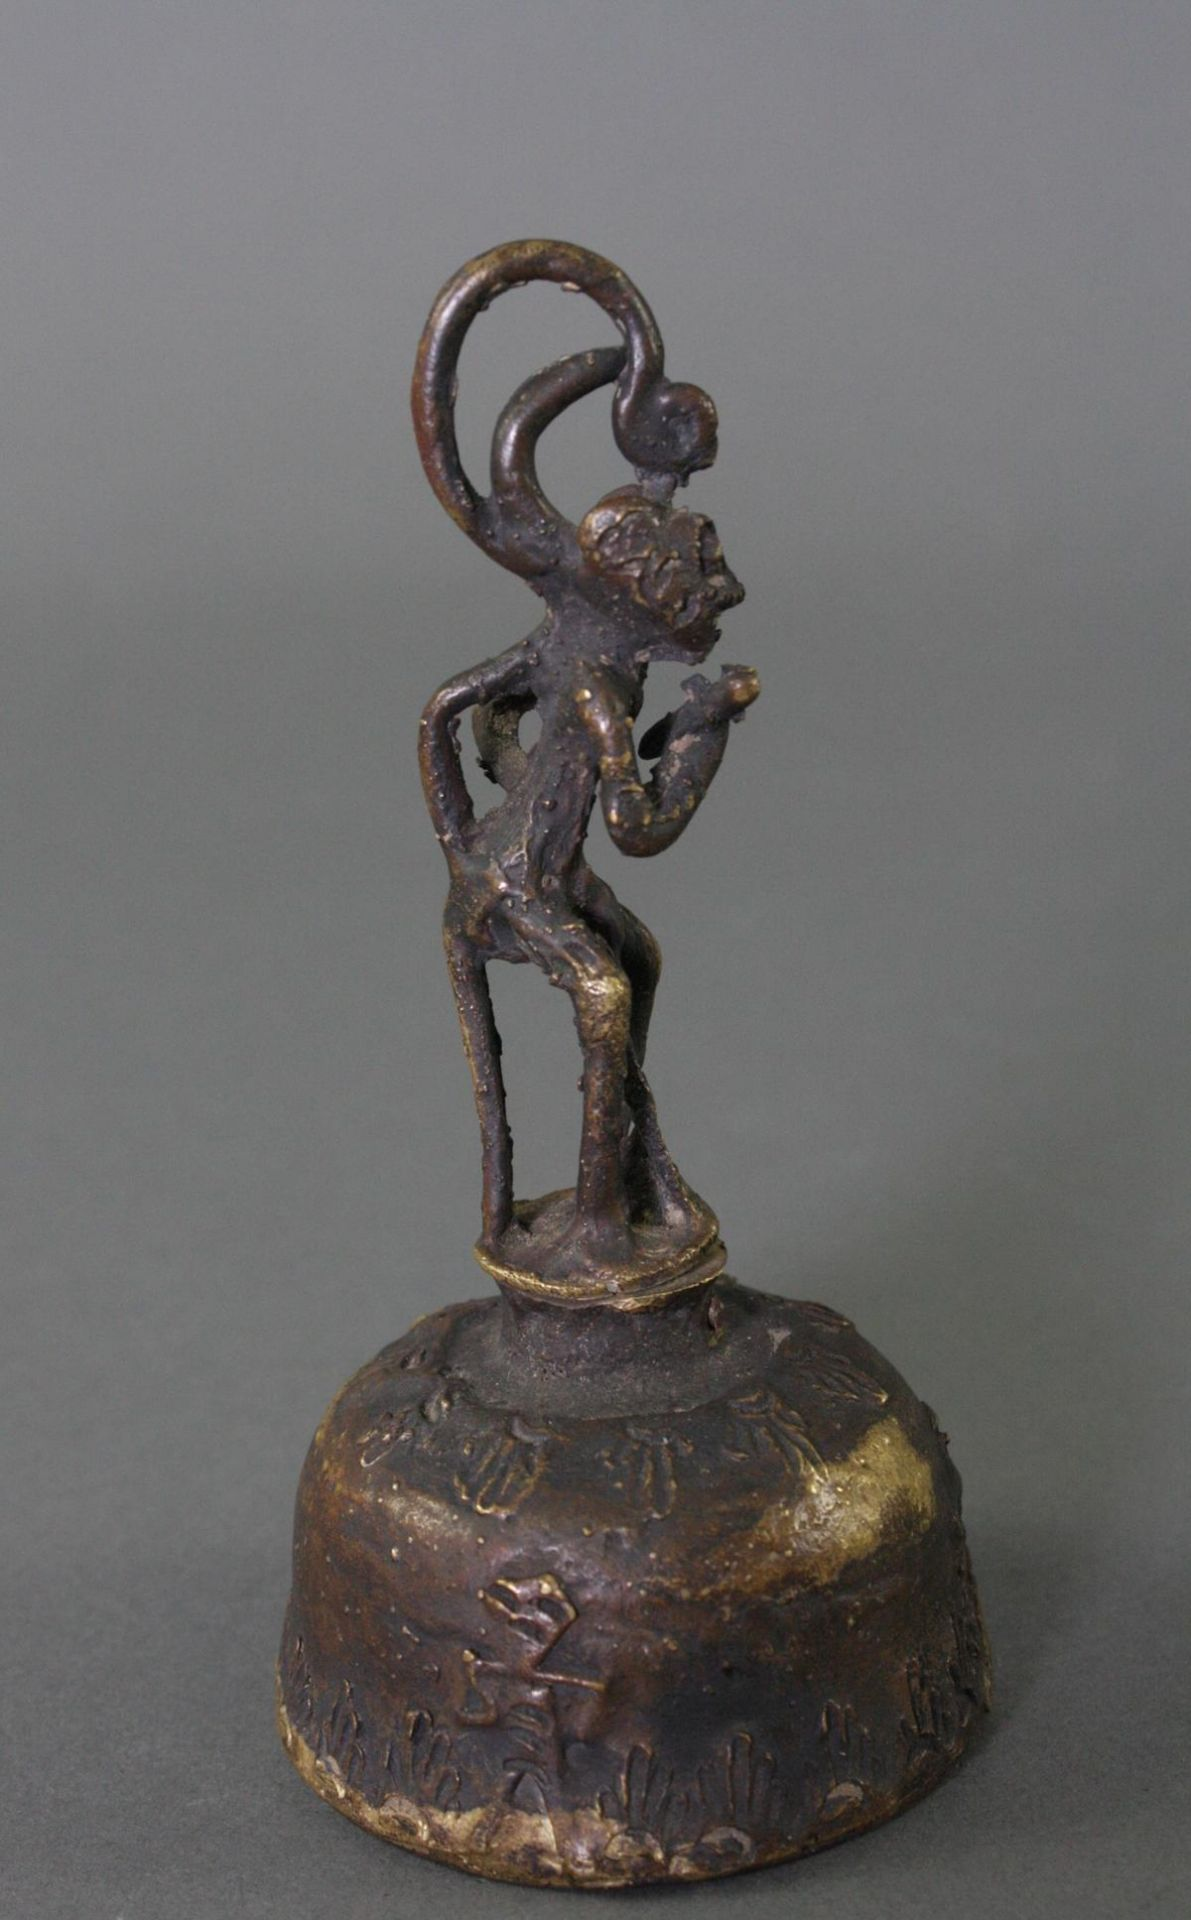 Hanuman-Glocke, Indien 19. Jahrhundert - Bild 4 aus 5